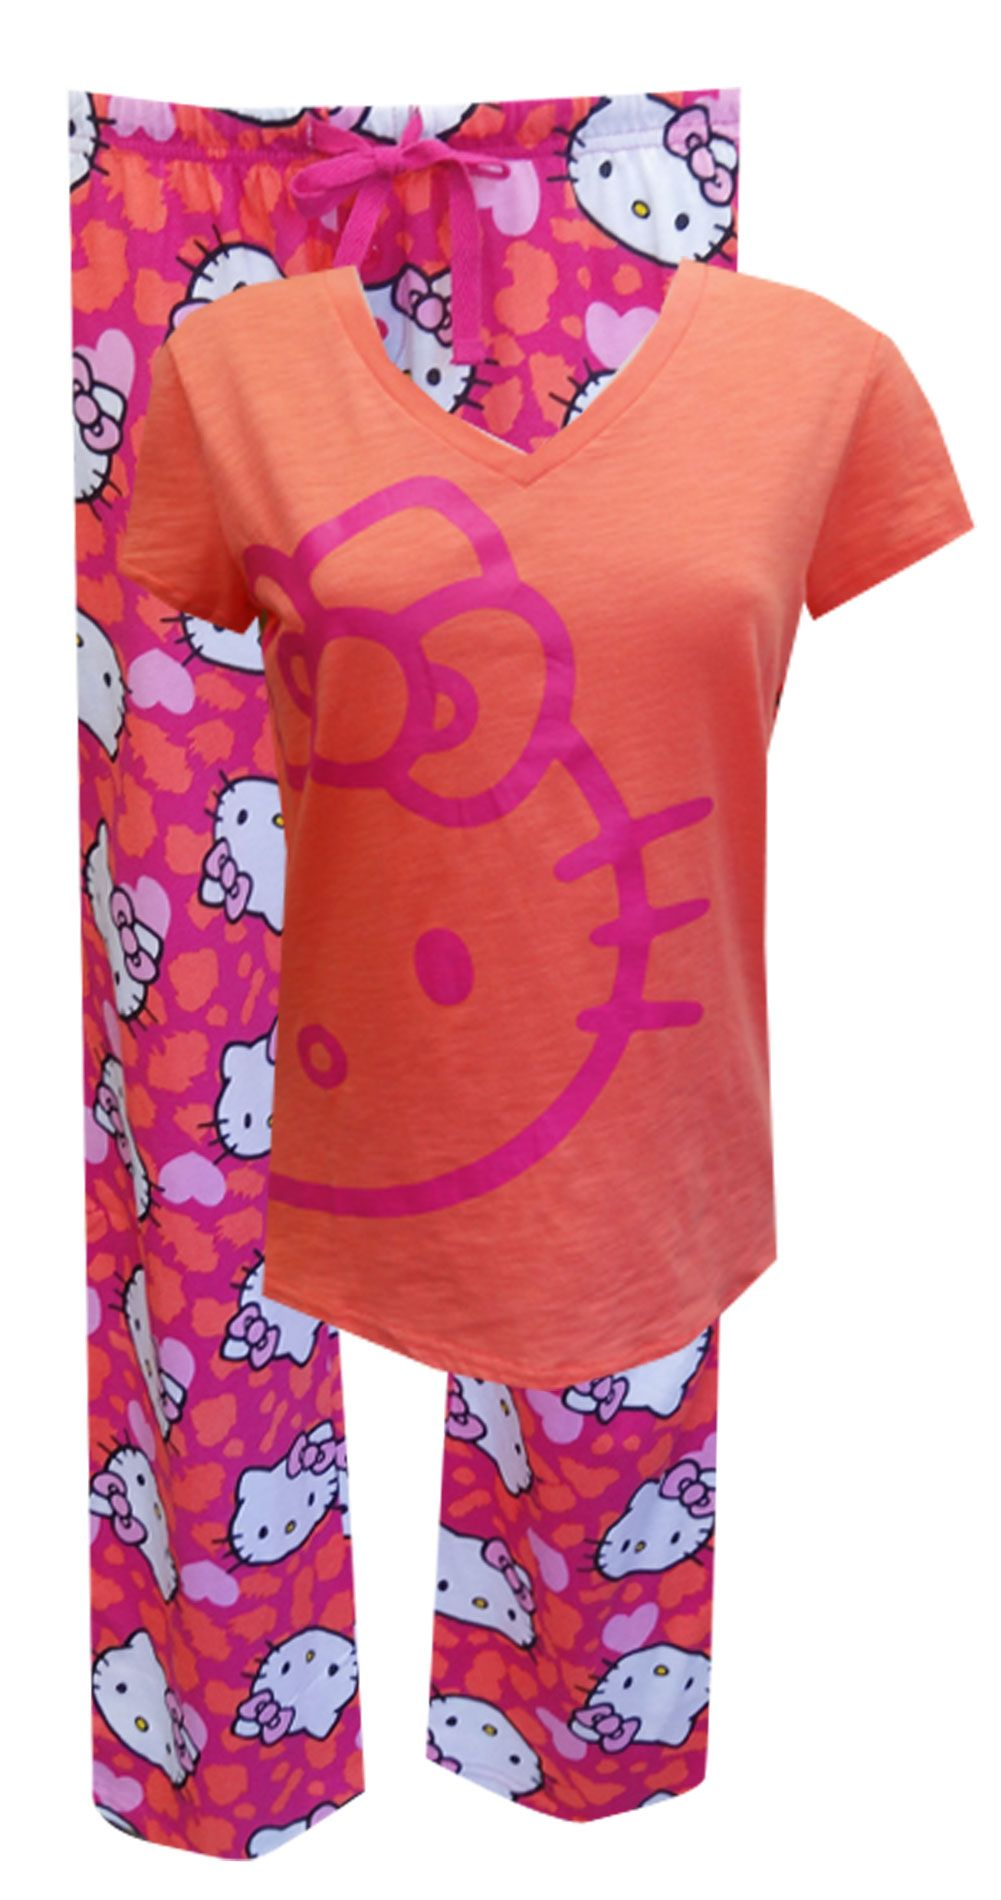 29846cb1d The best source of fun underwear, loungewear & pajamas since 1999. Hello  Kitty ...